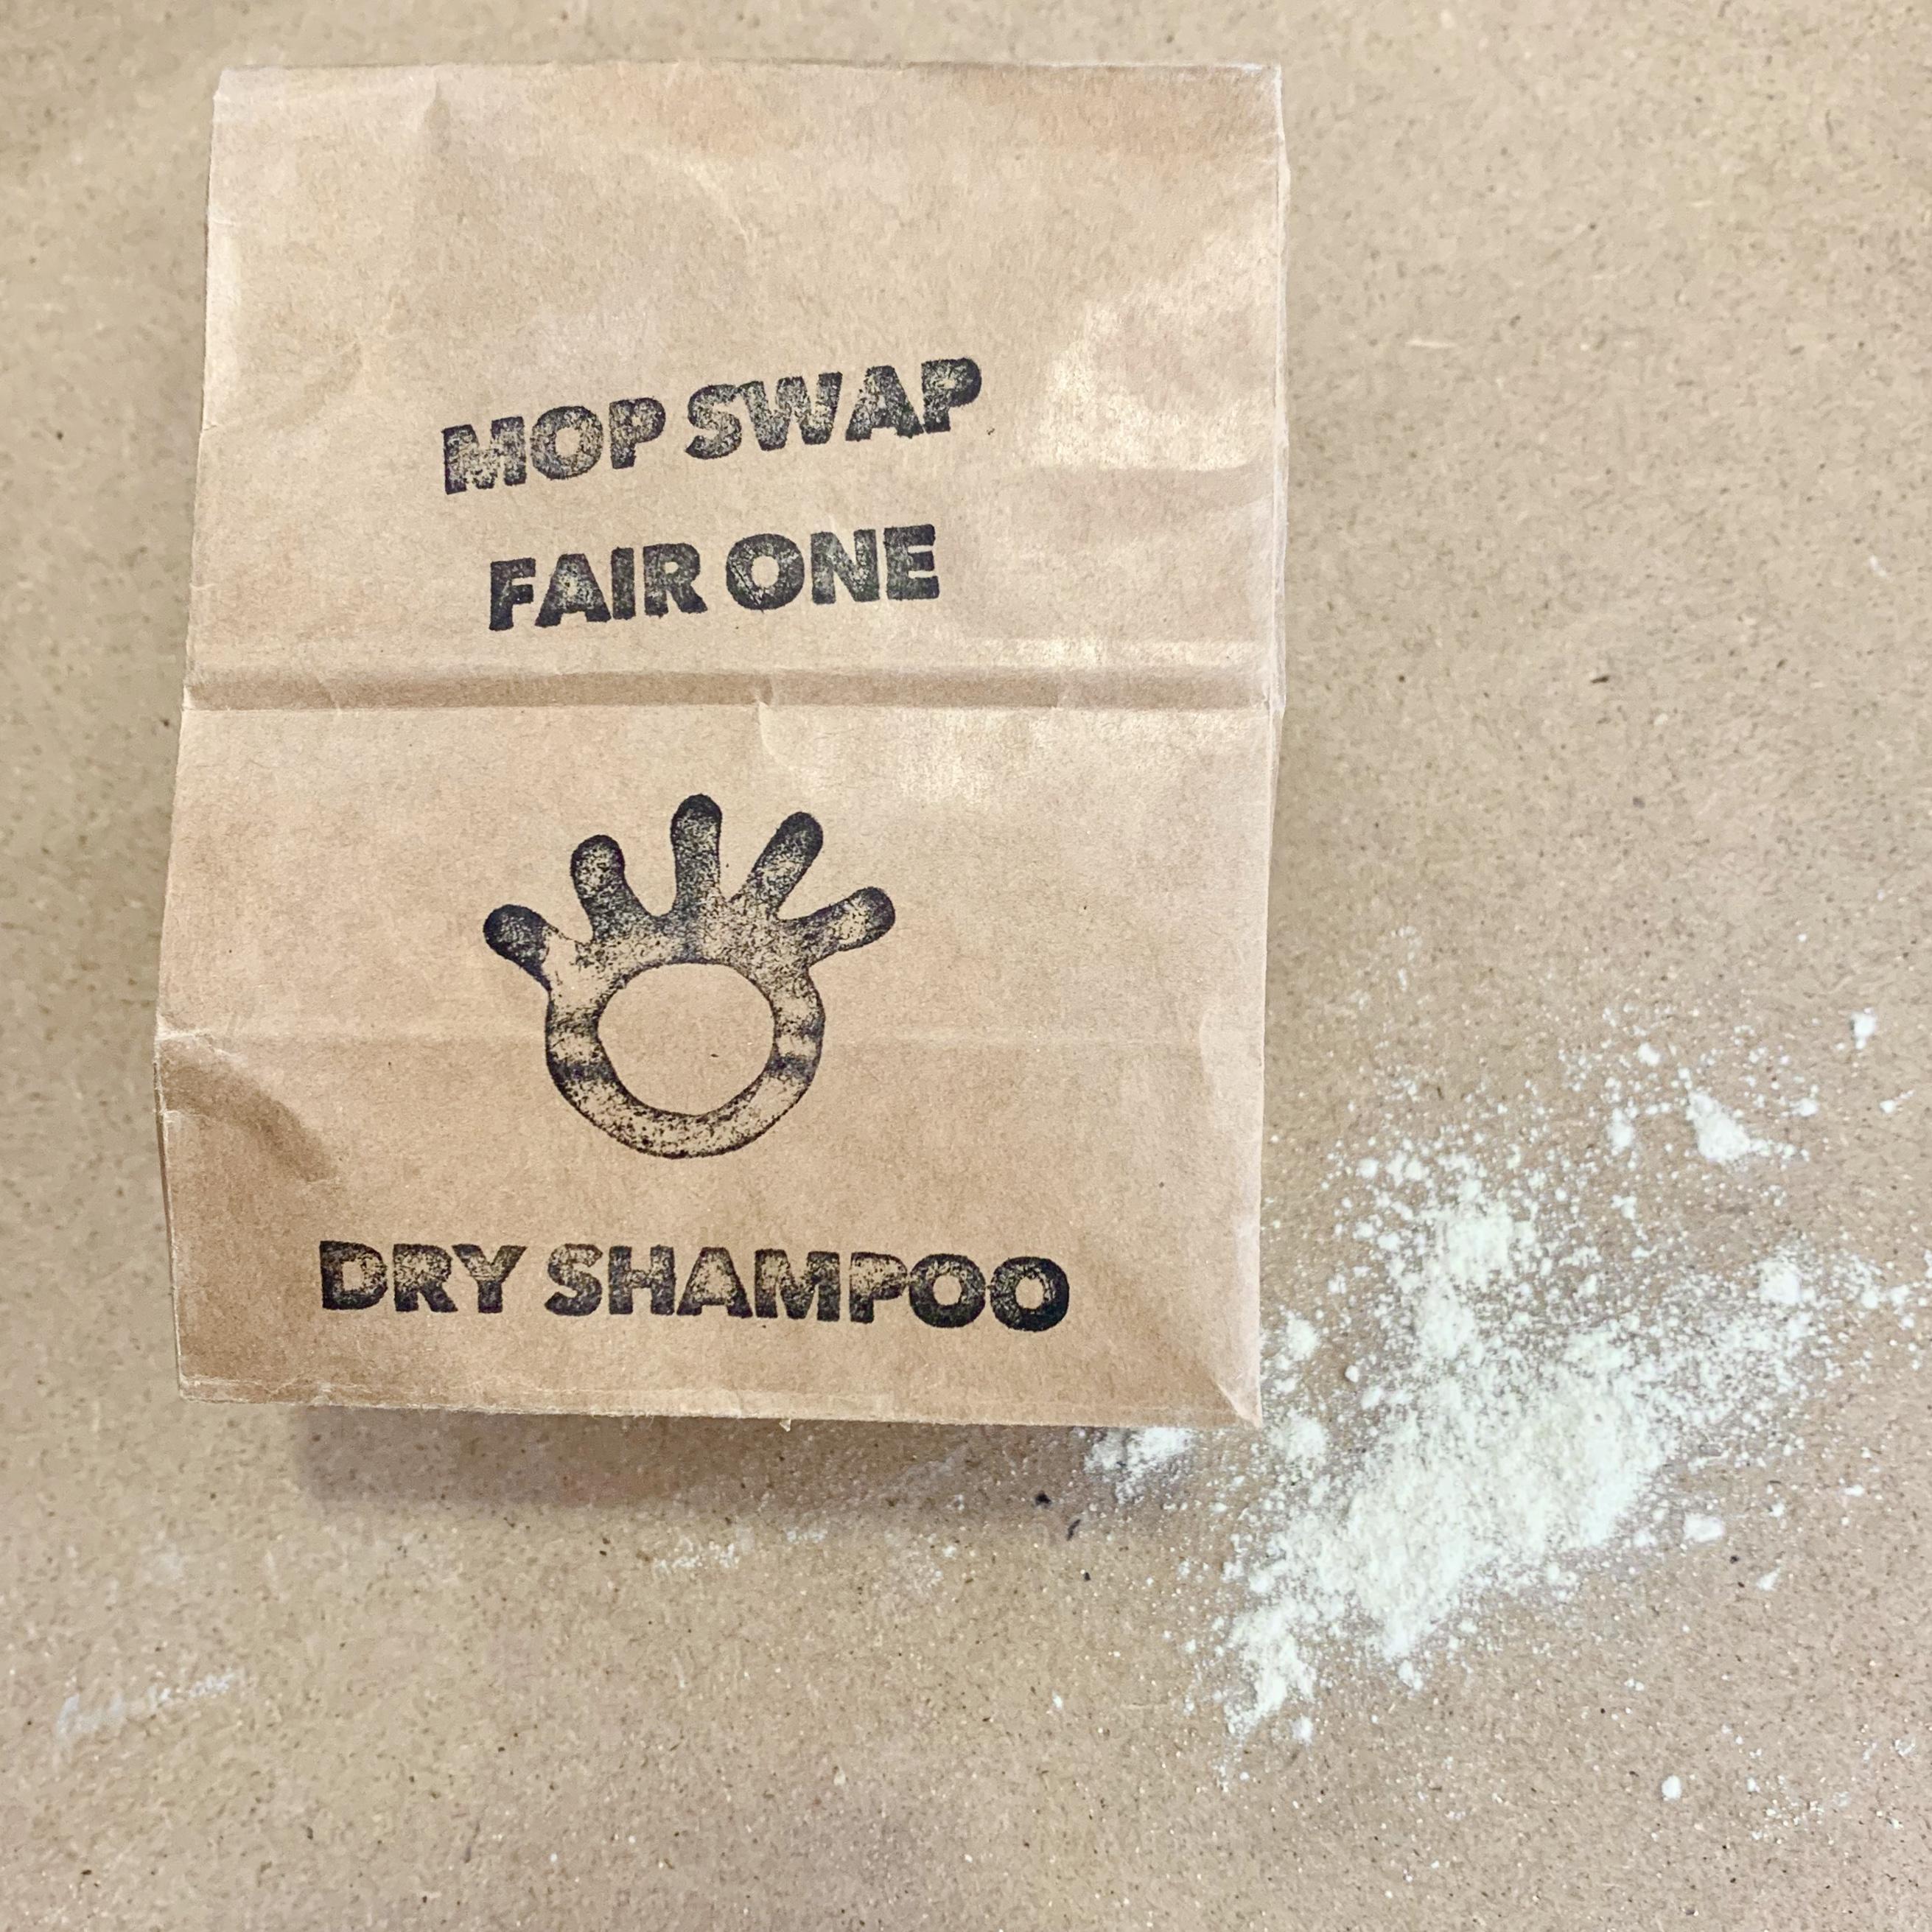 Dry Shampoo (Mop Swap)